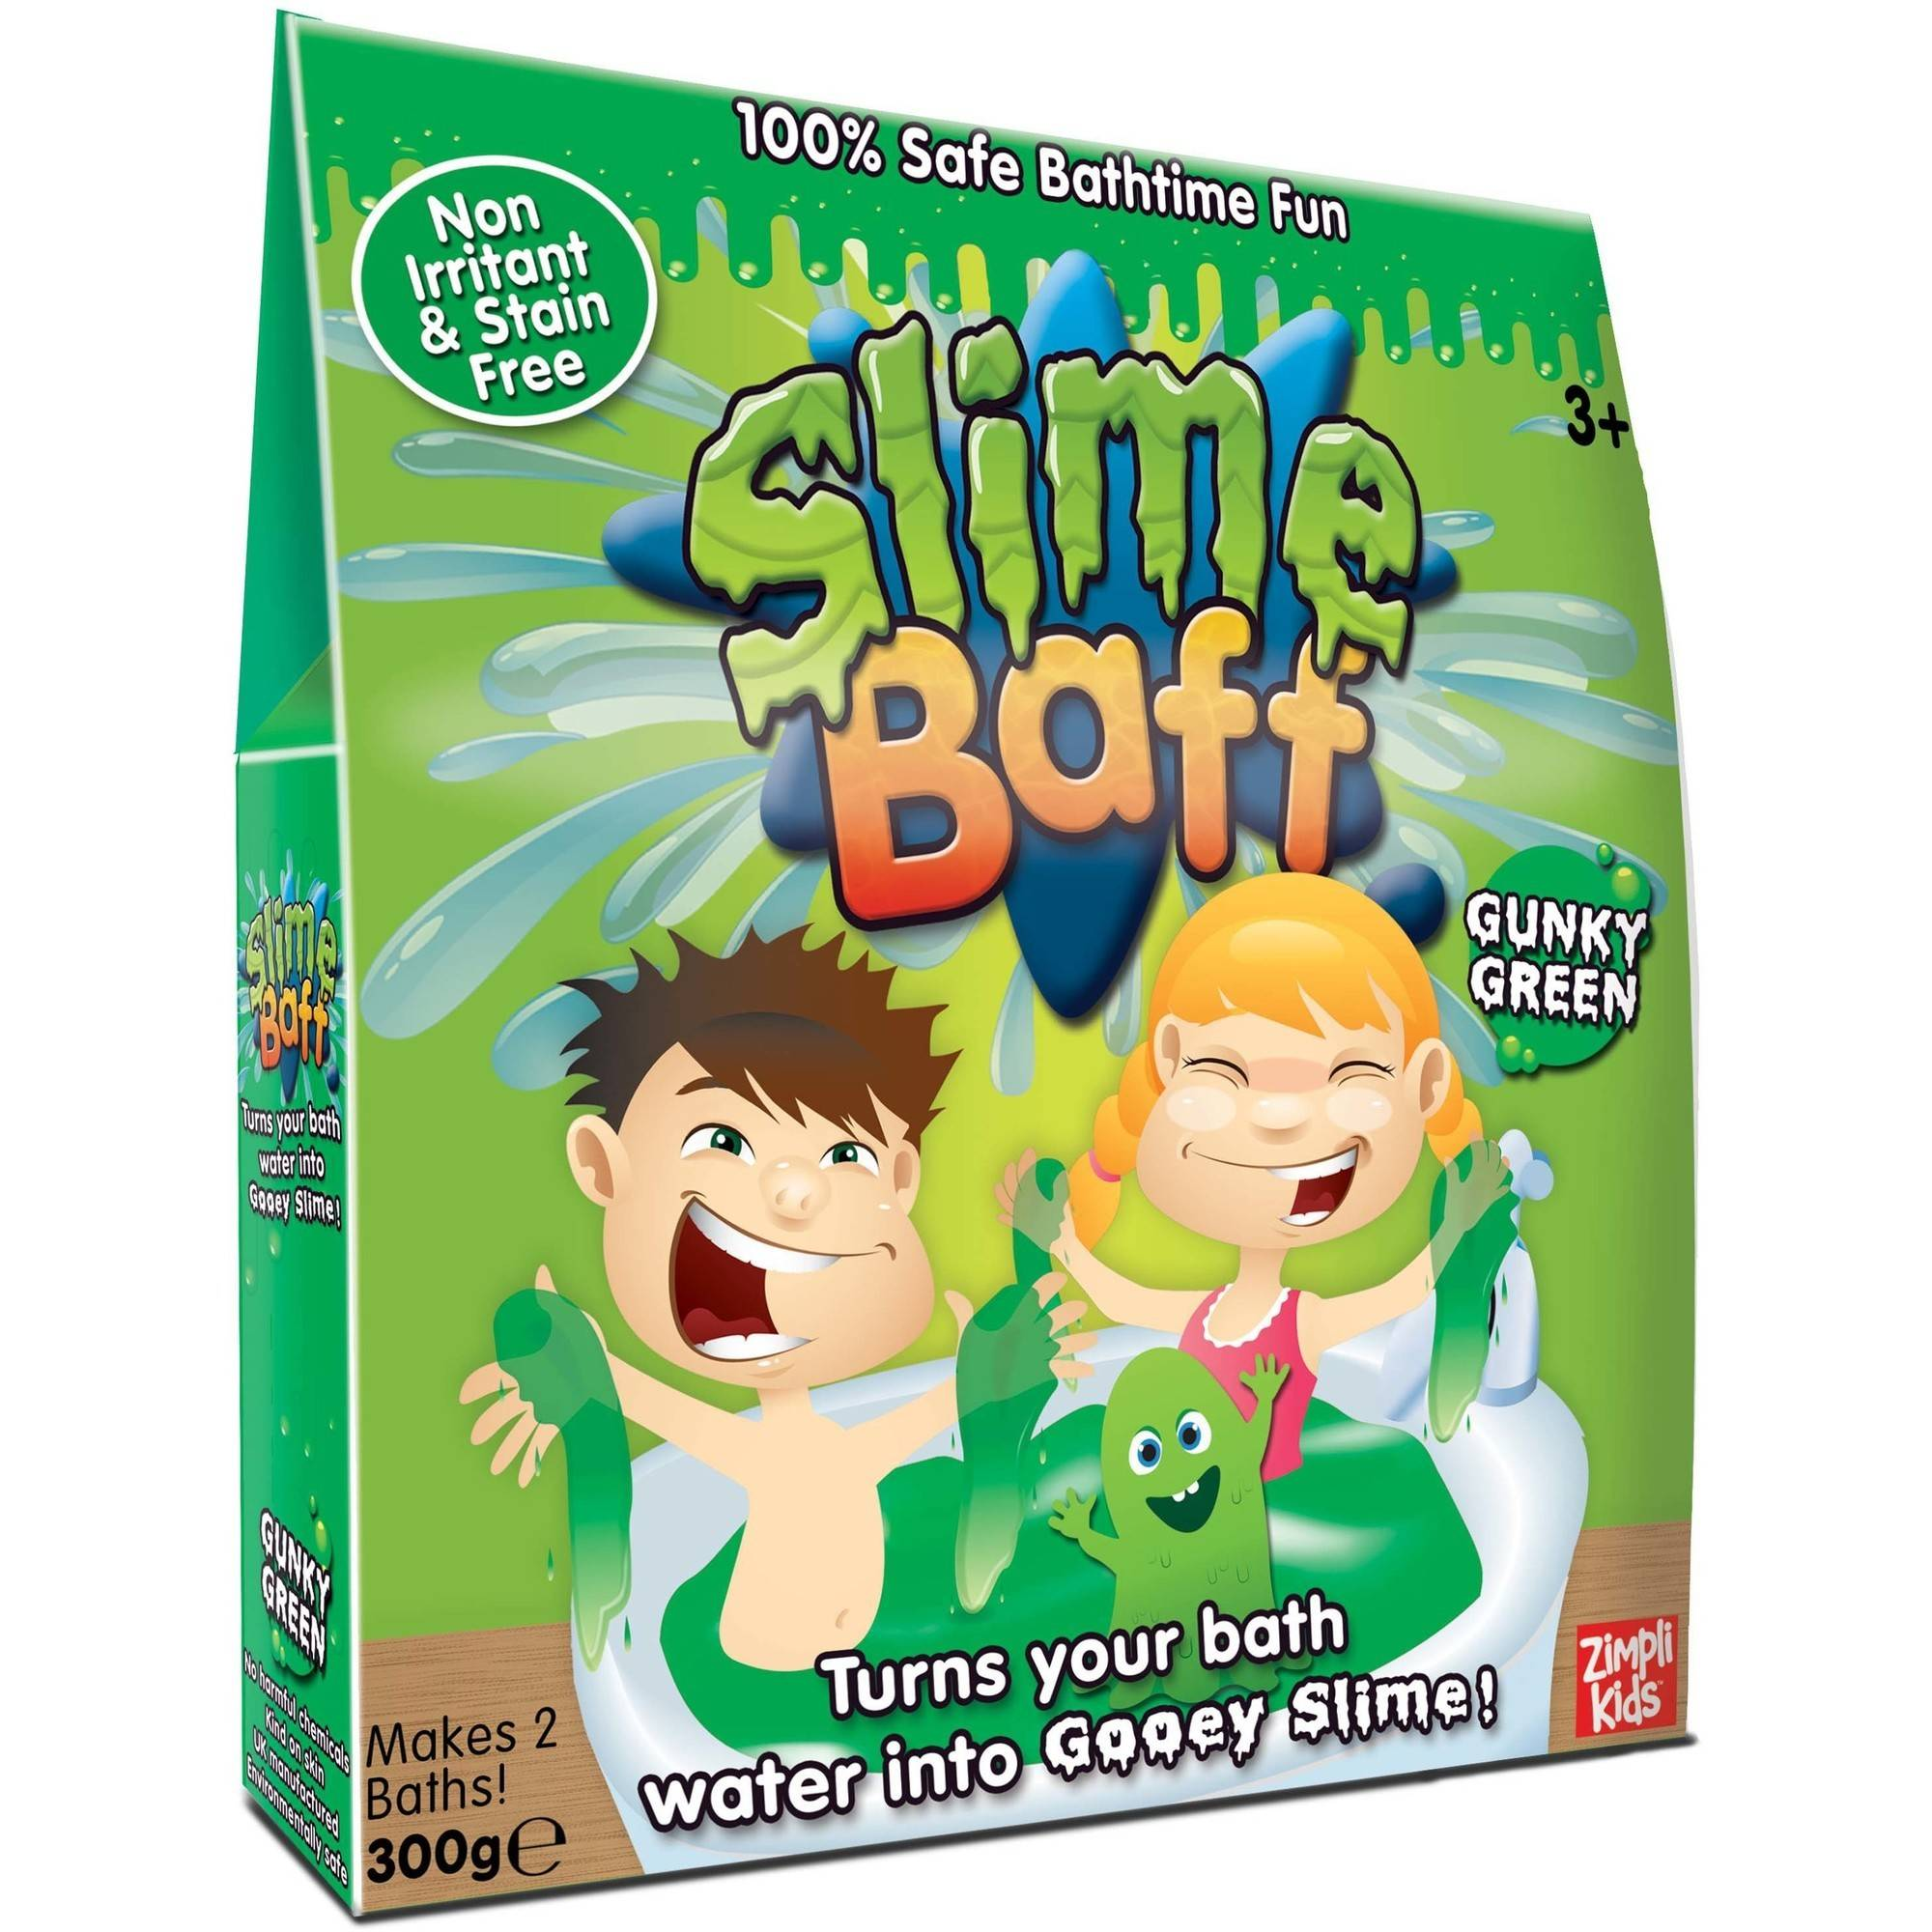 Zimpli Kids Green Bath Slime Baff 2-Uses